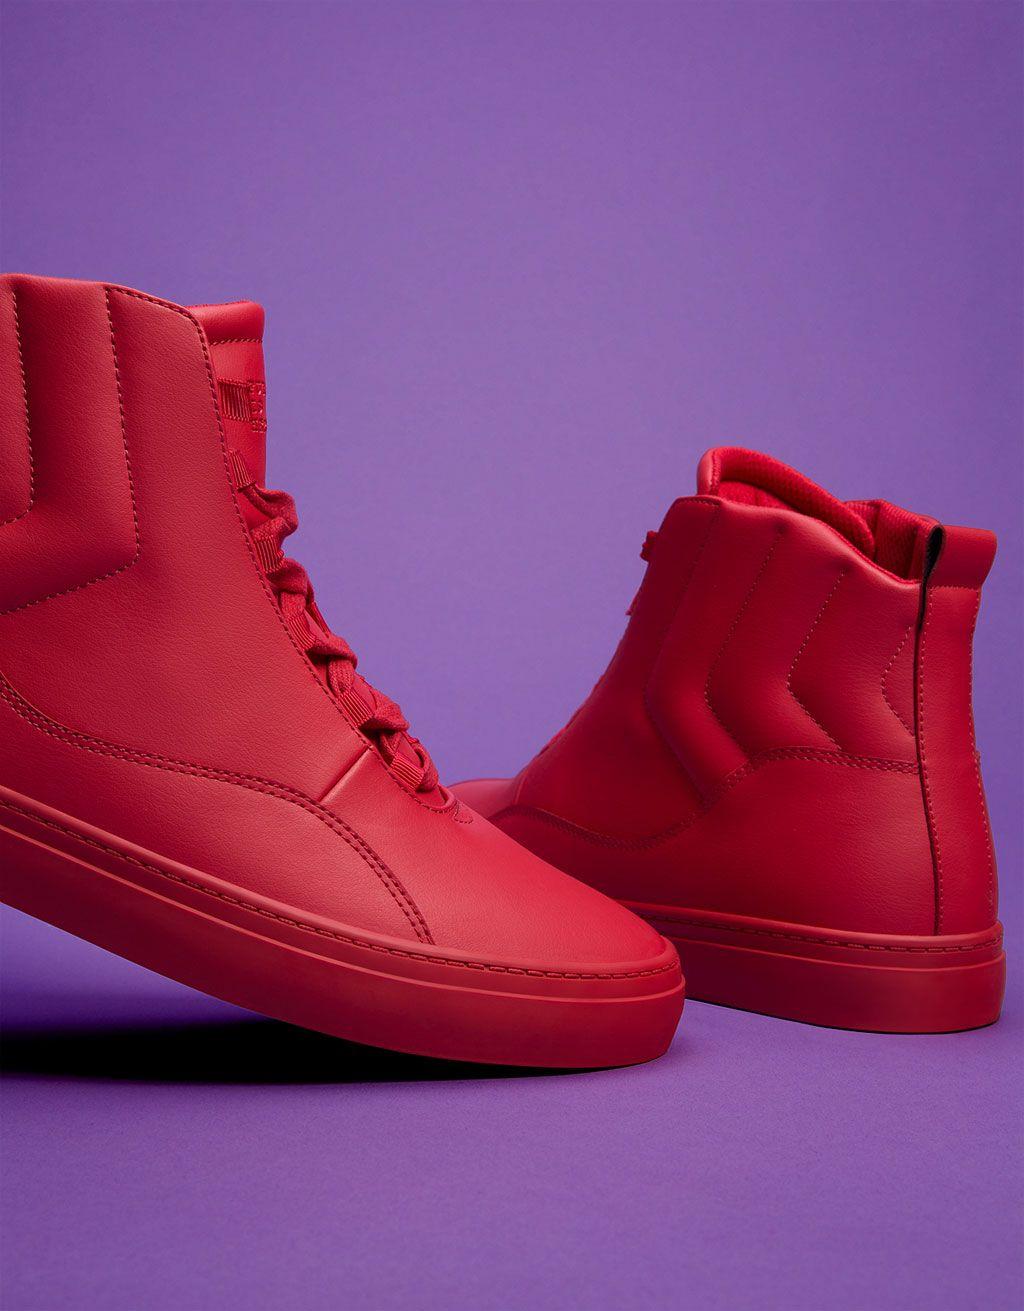 caba2de58e0 Men's quilted monochrome high top sneakers | man sneaker | High tops ...